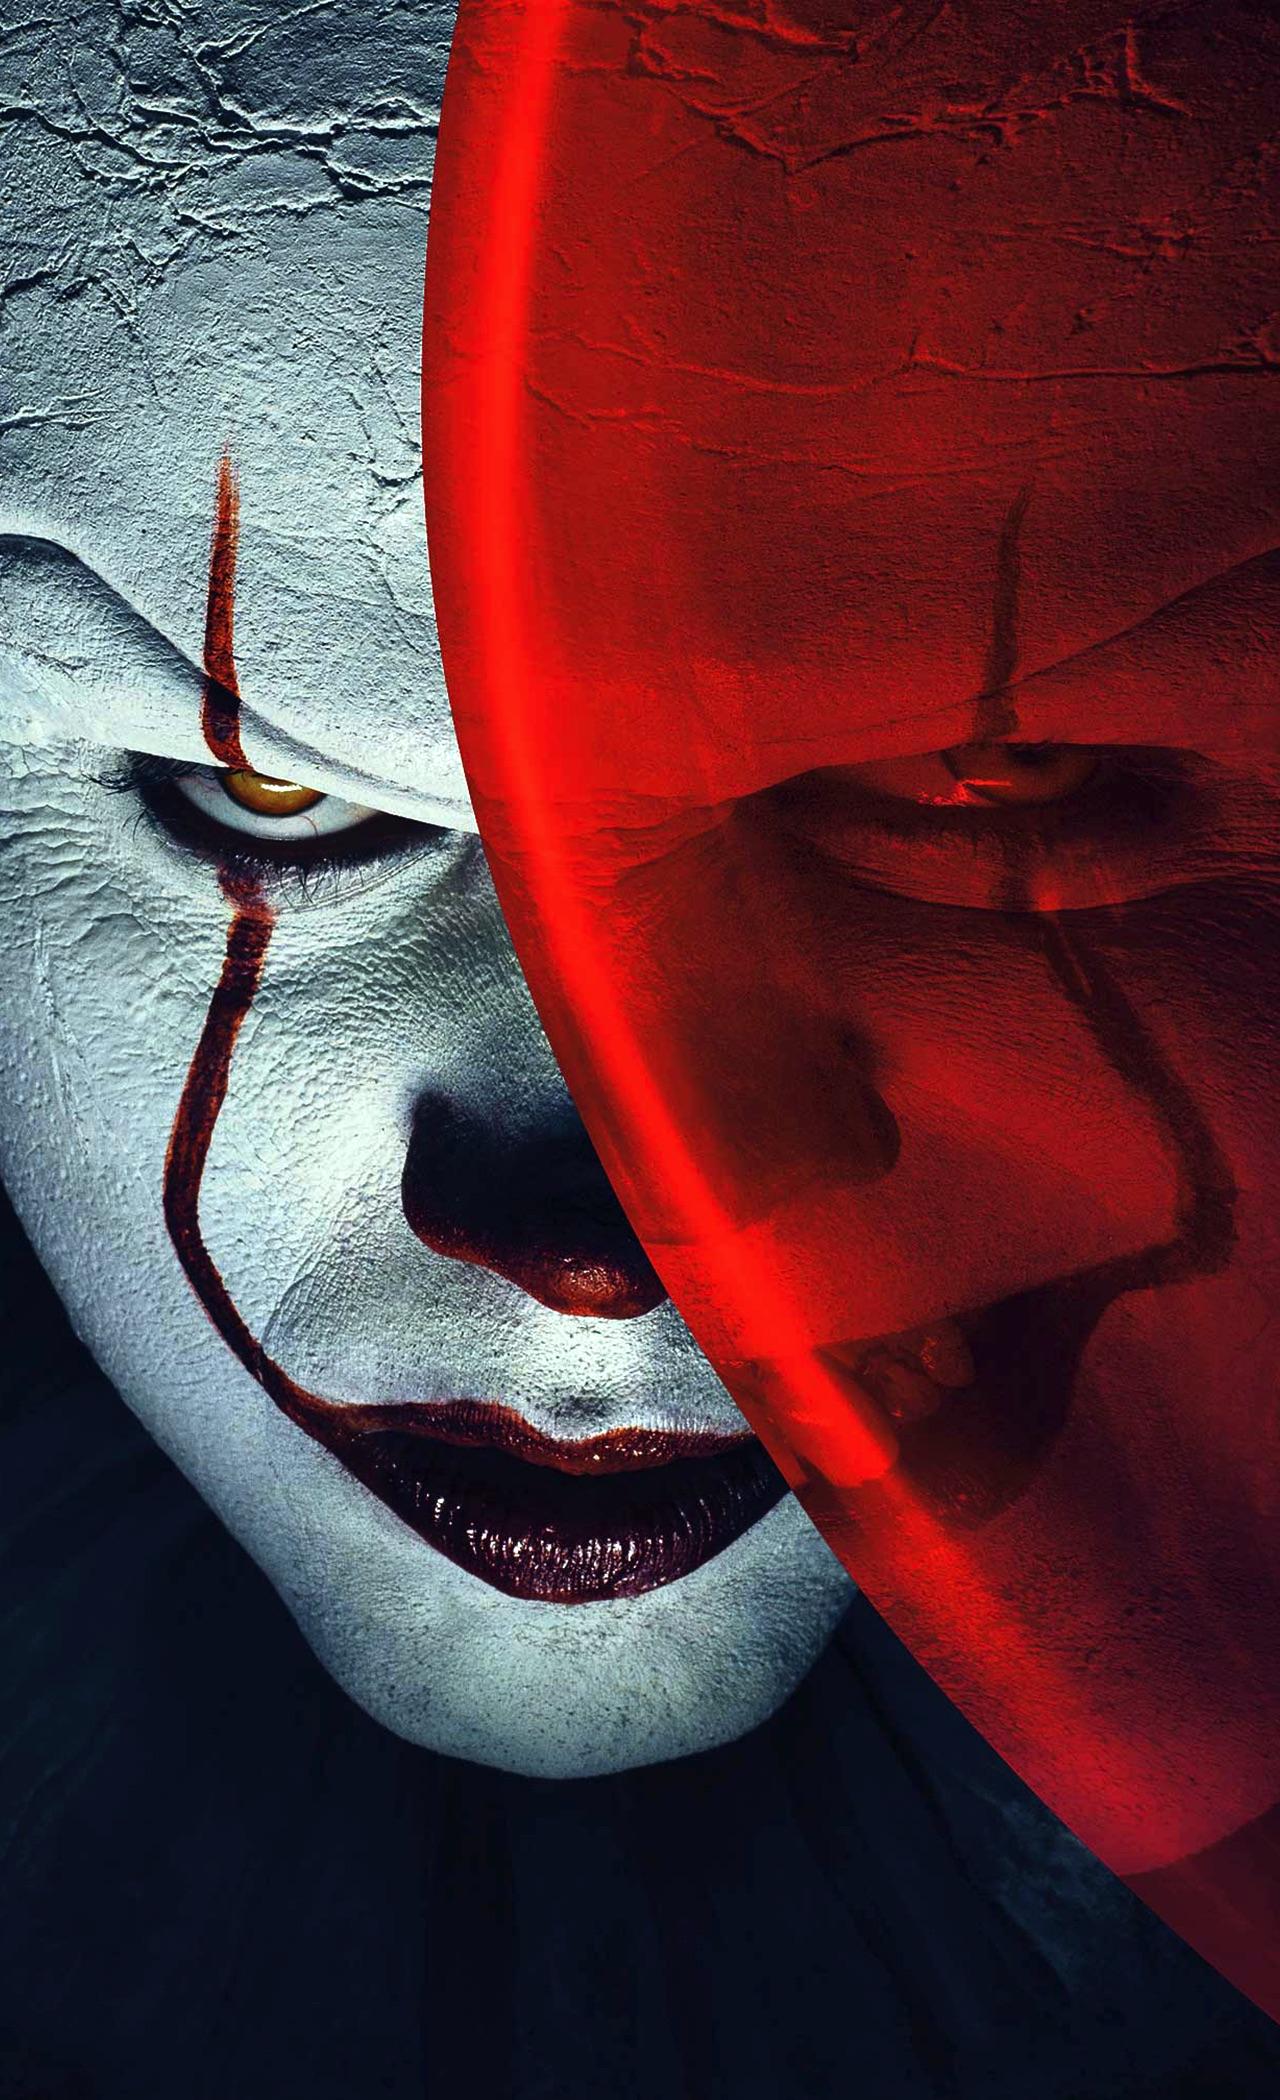 Download 1280x2120 wallpaper joker, clown, it, balloon